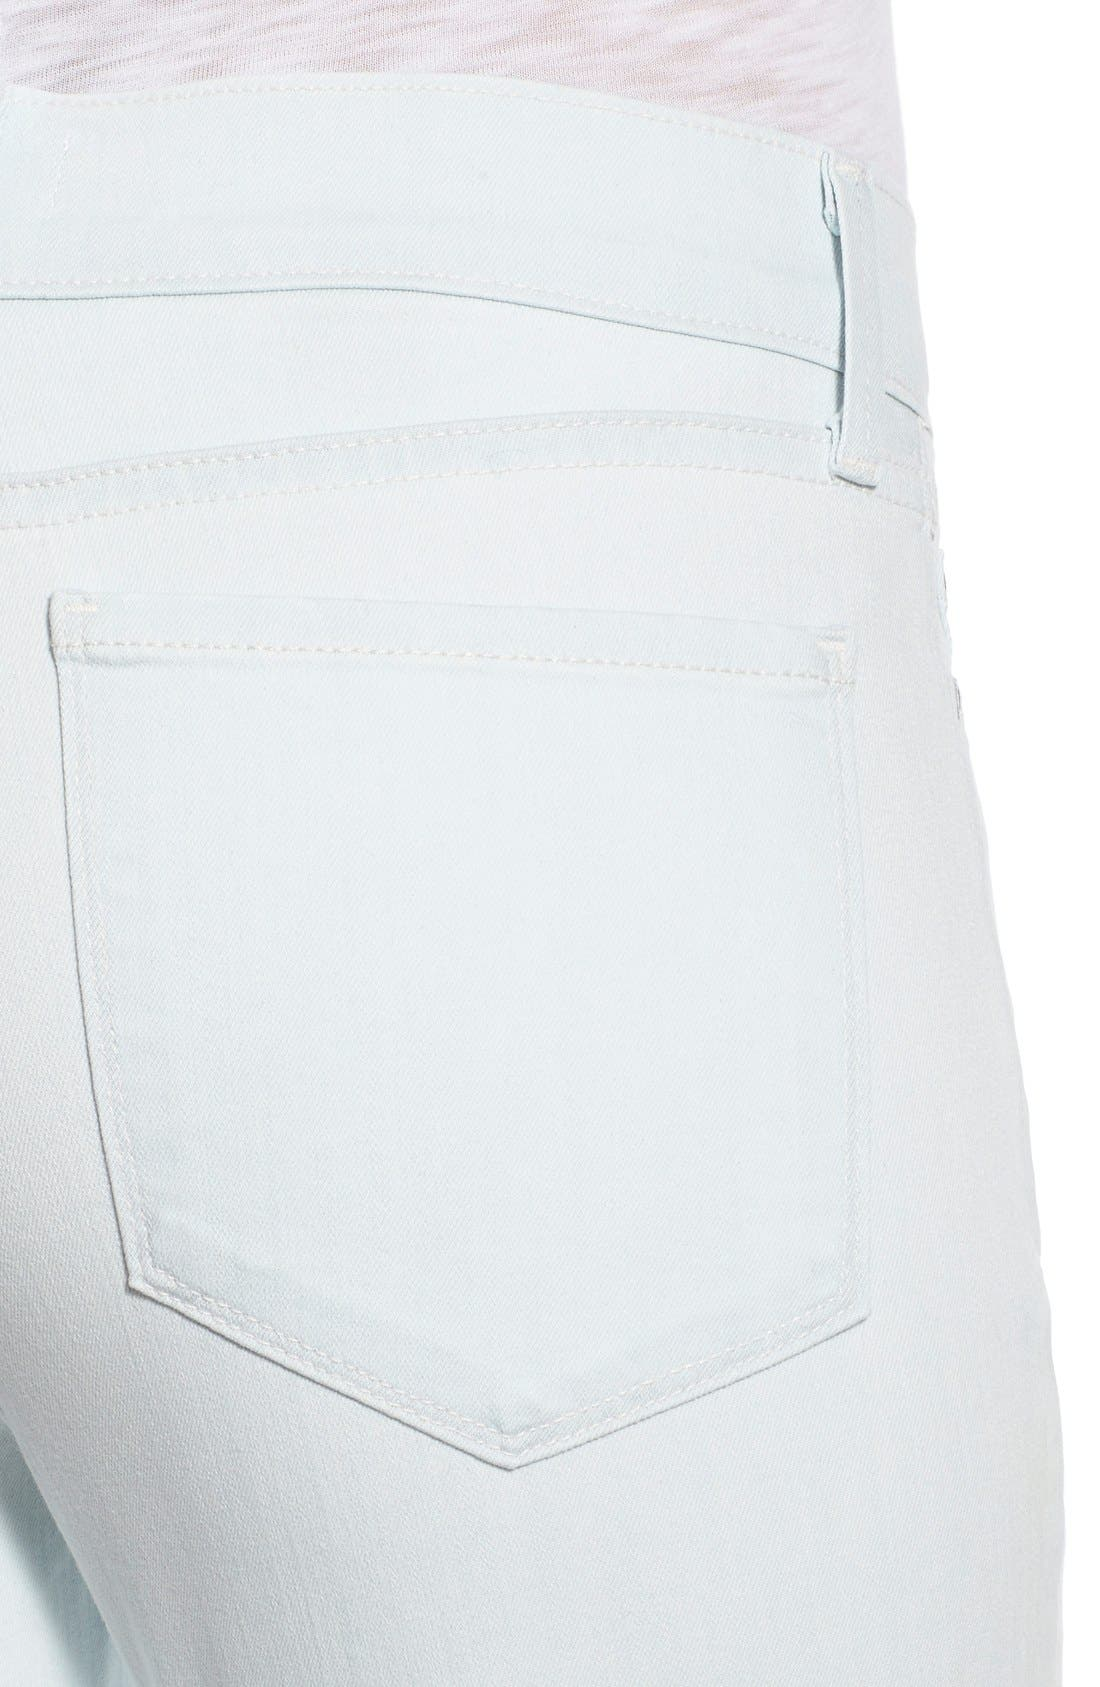 'Dayla' Colored Wide Cuff Capri Jeans,                             Alternate thumbnail 55, color,